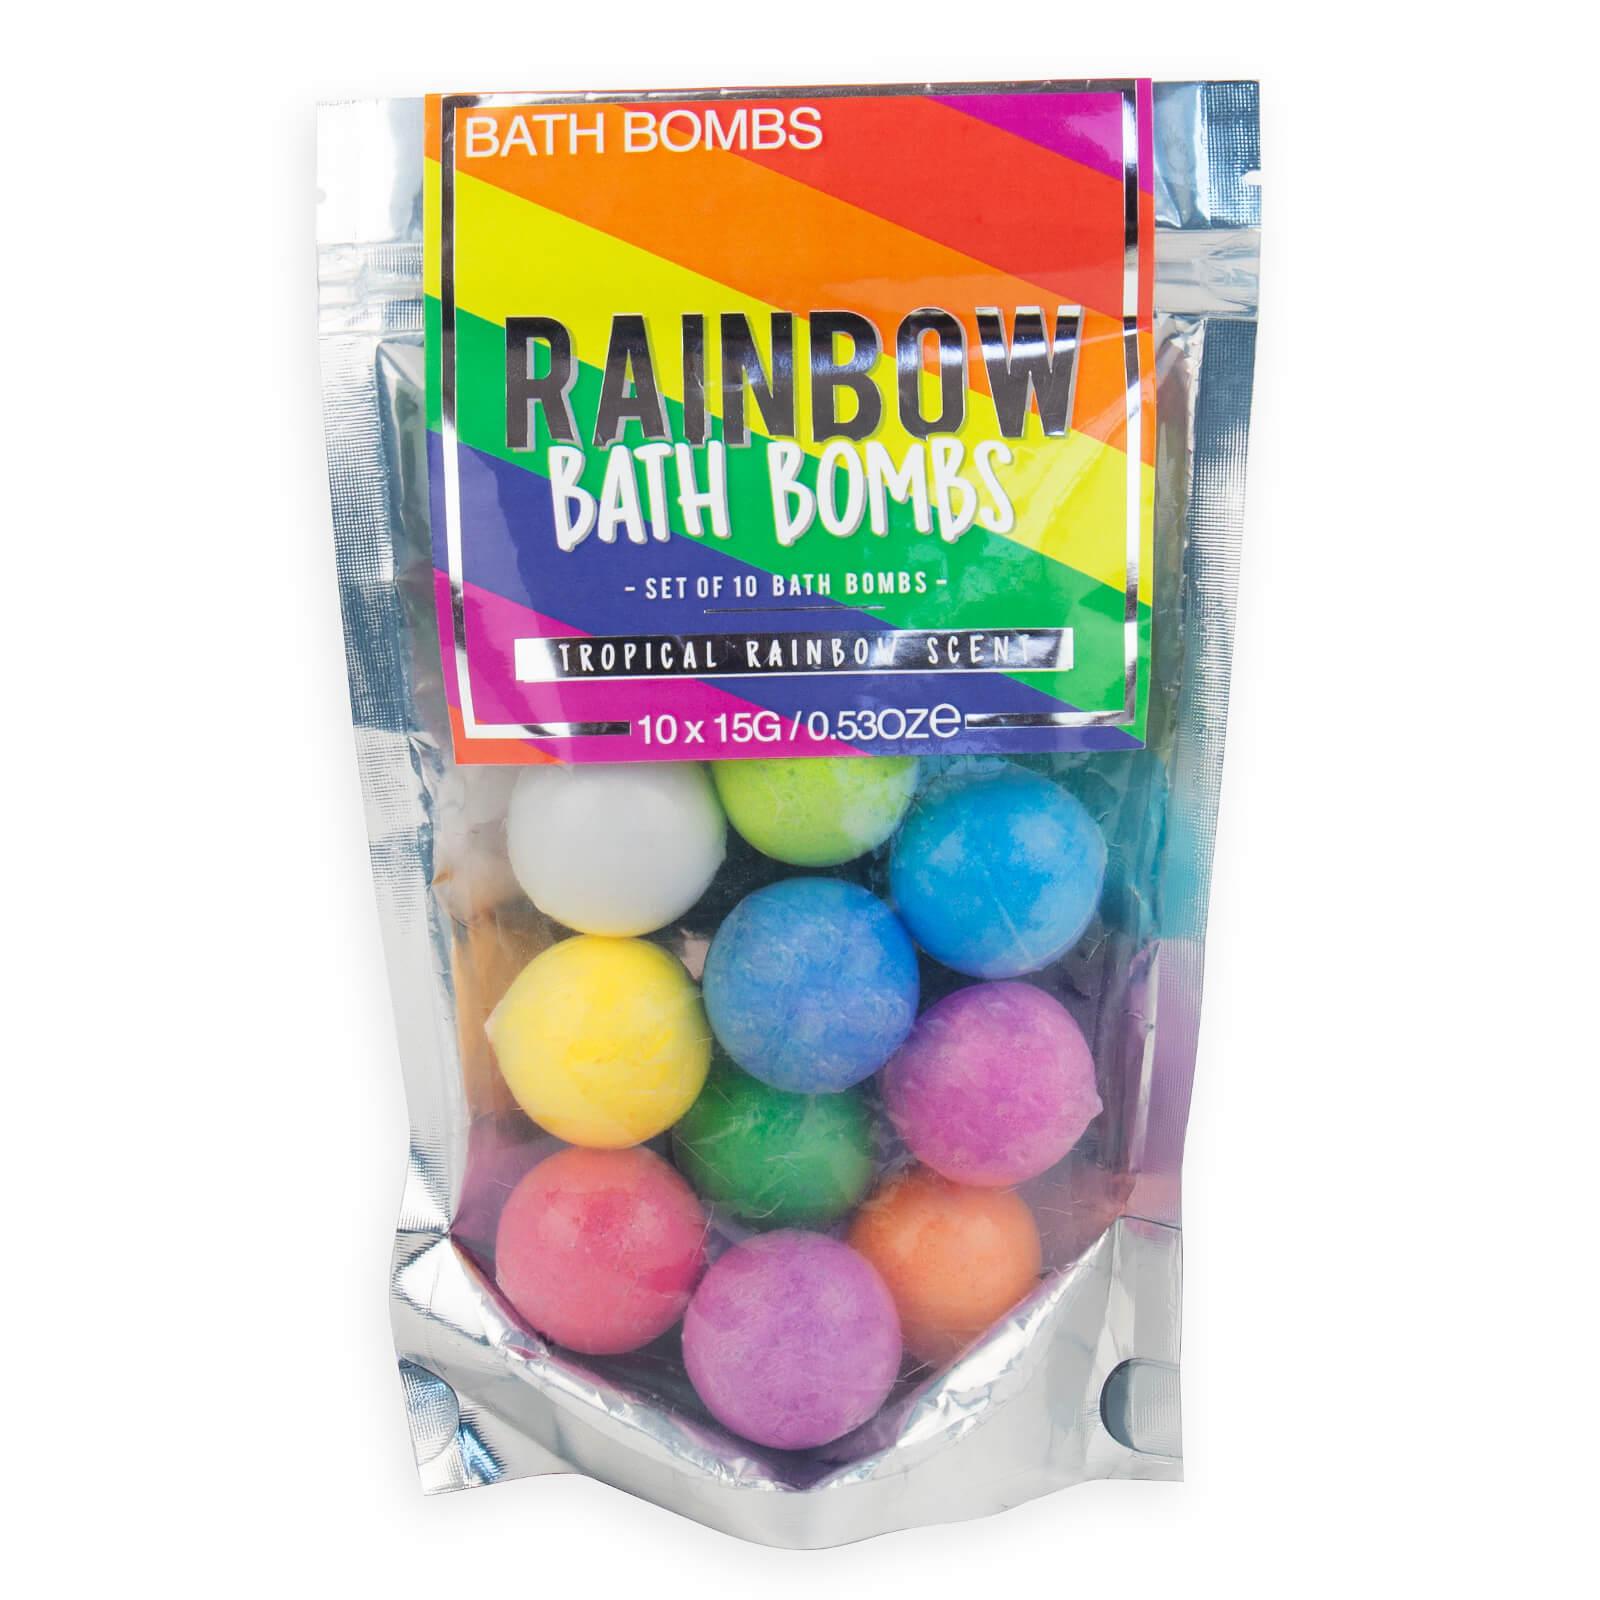 Image of Rainbow Bath Bombs